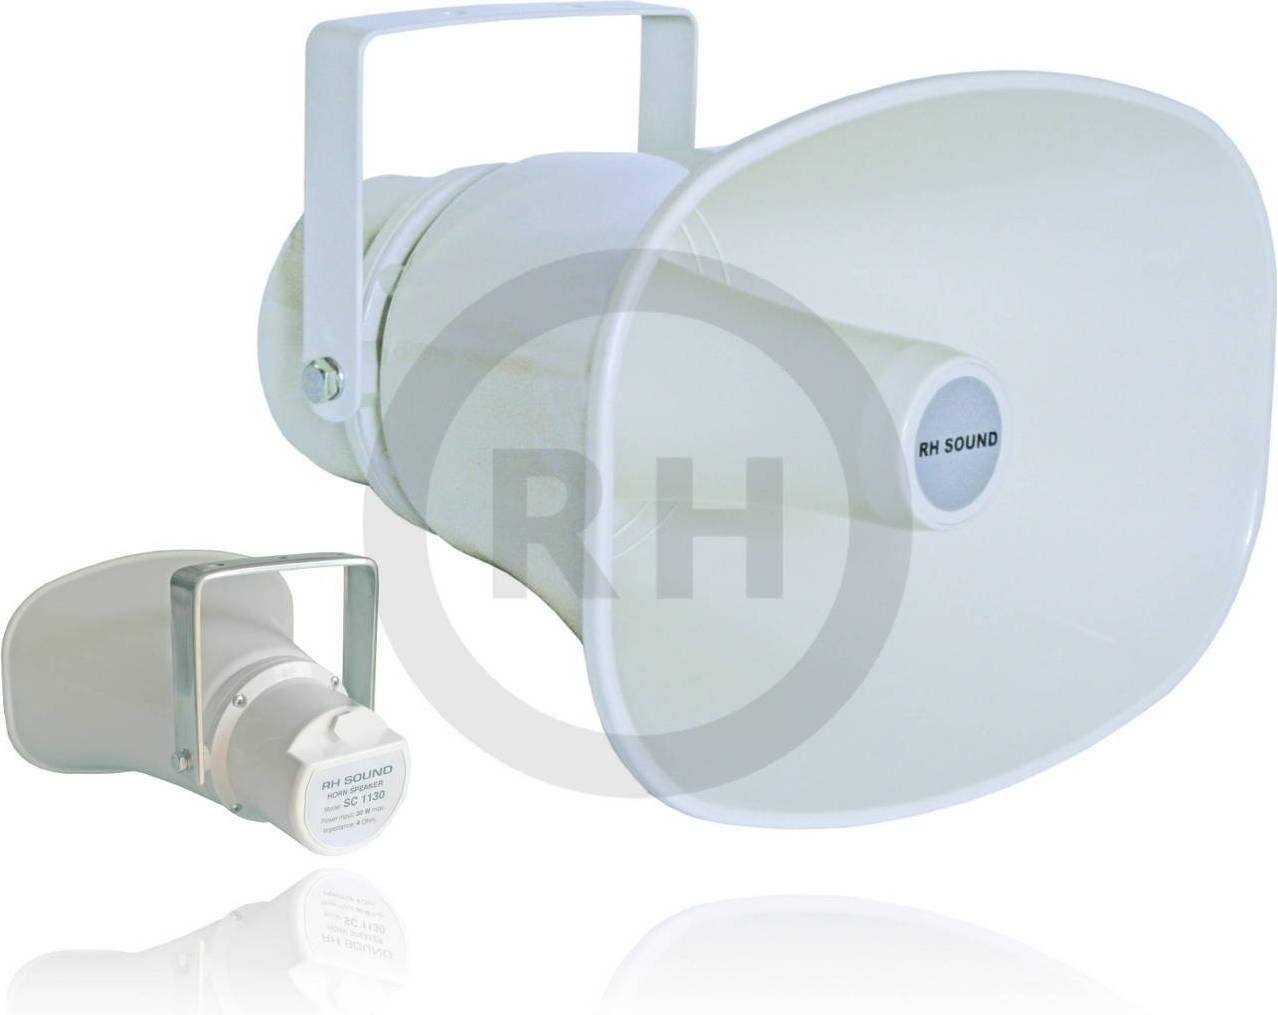 SC-1130 Megafon 4Ohm